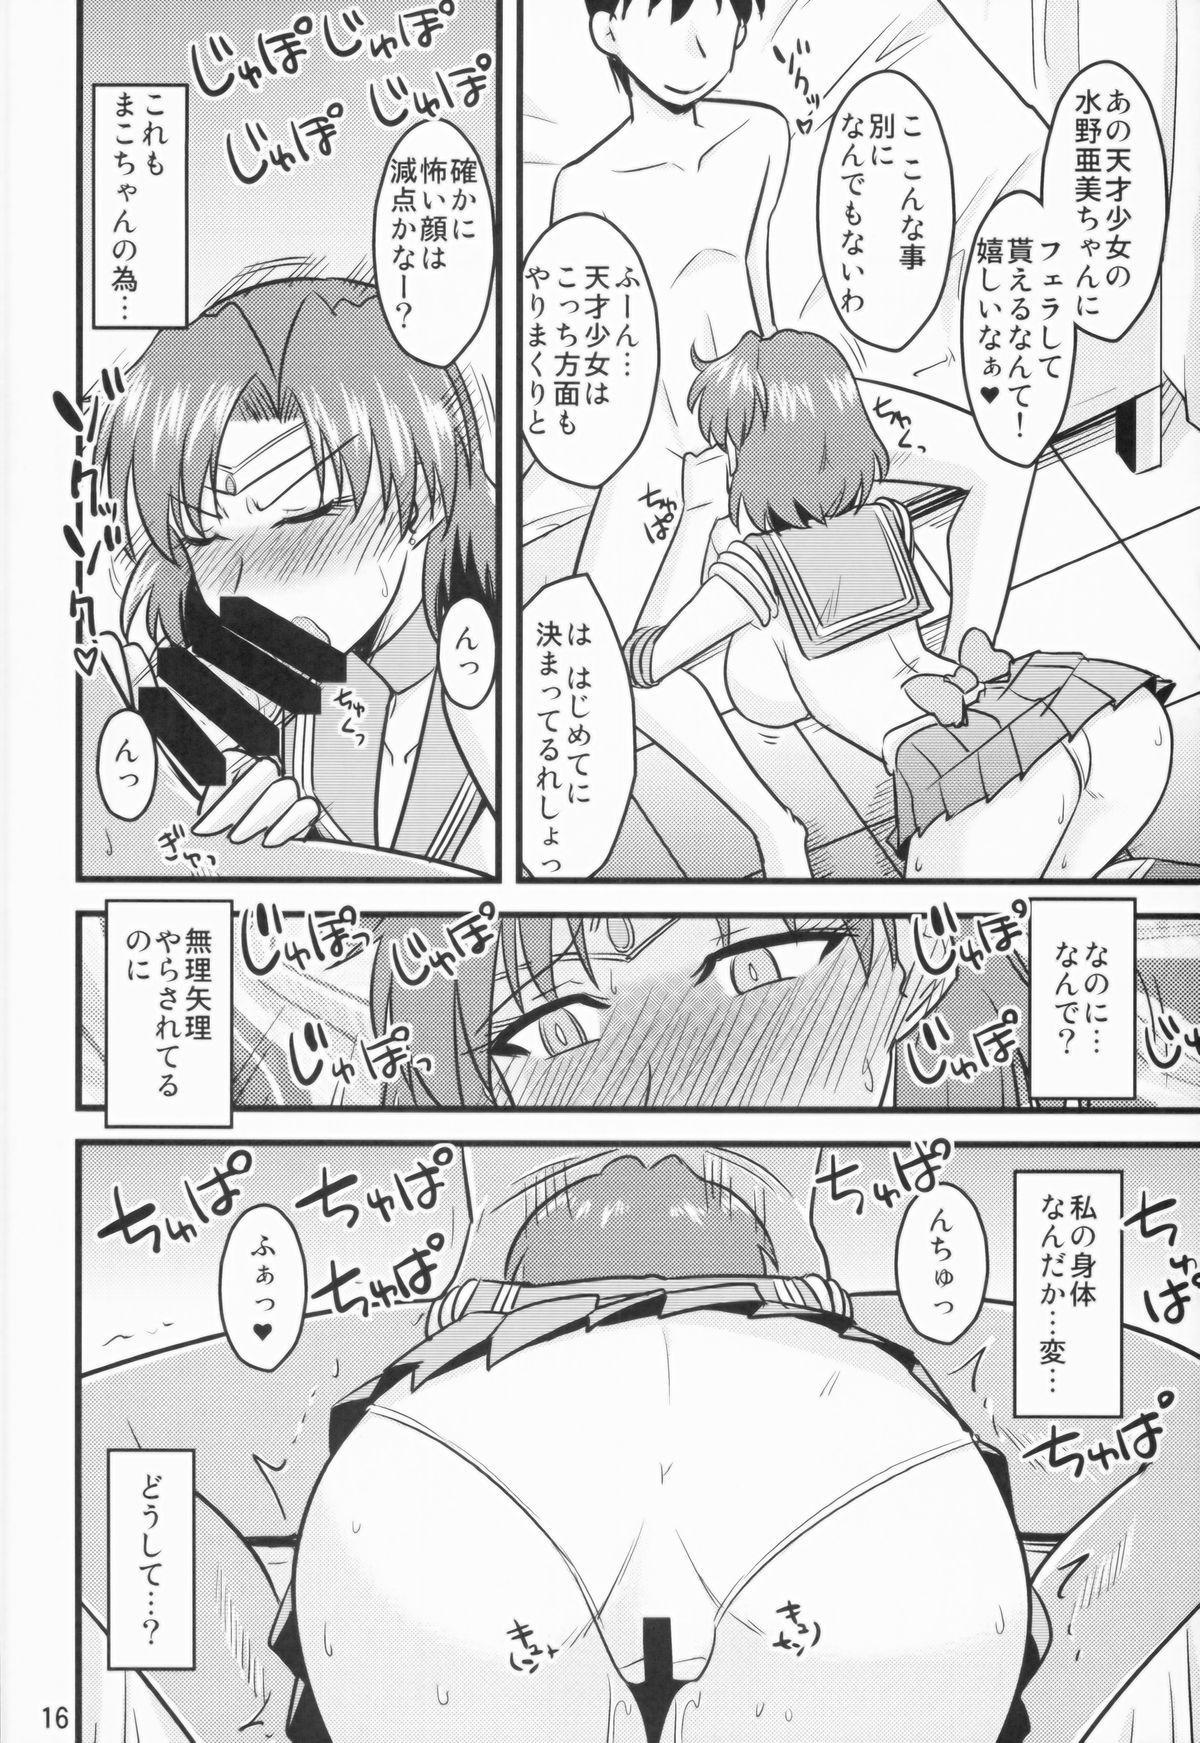 Suimoku no Musume 15